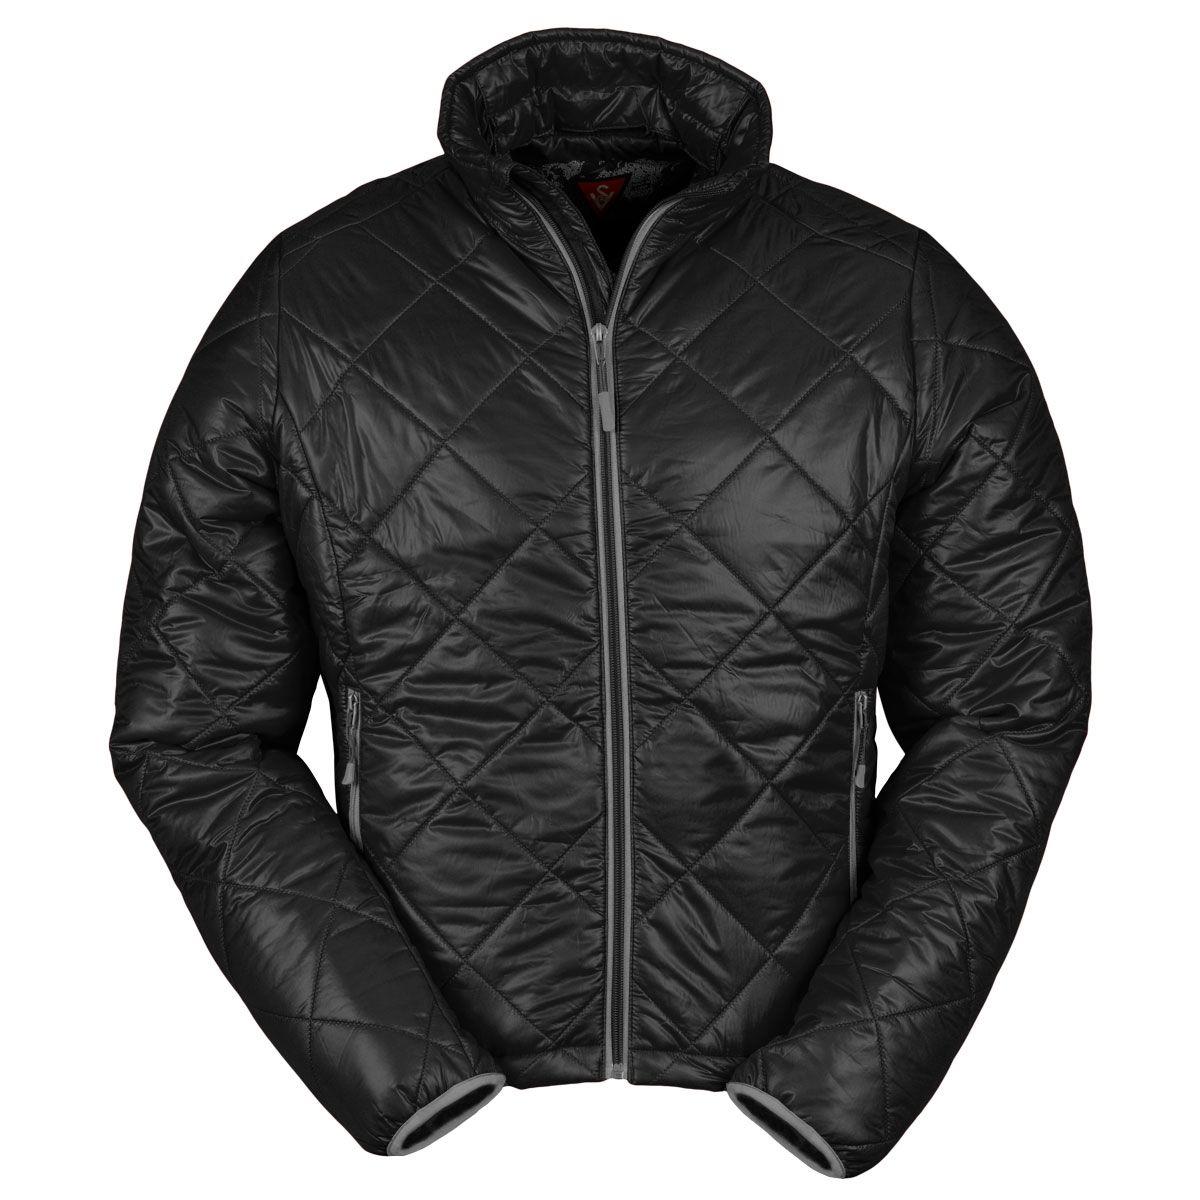 SeV Puffer Jacket Men's Mens puffer jacket, Quilted